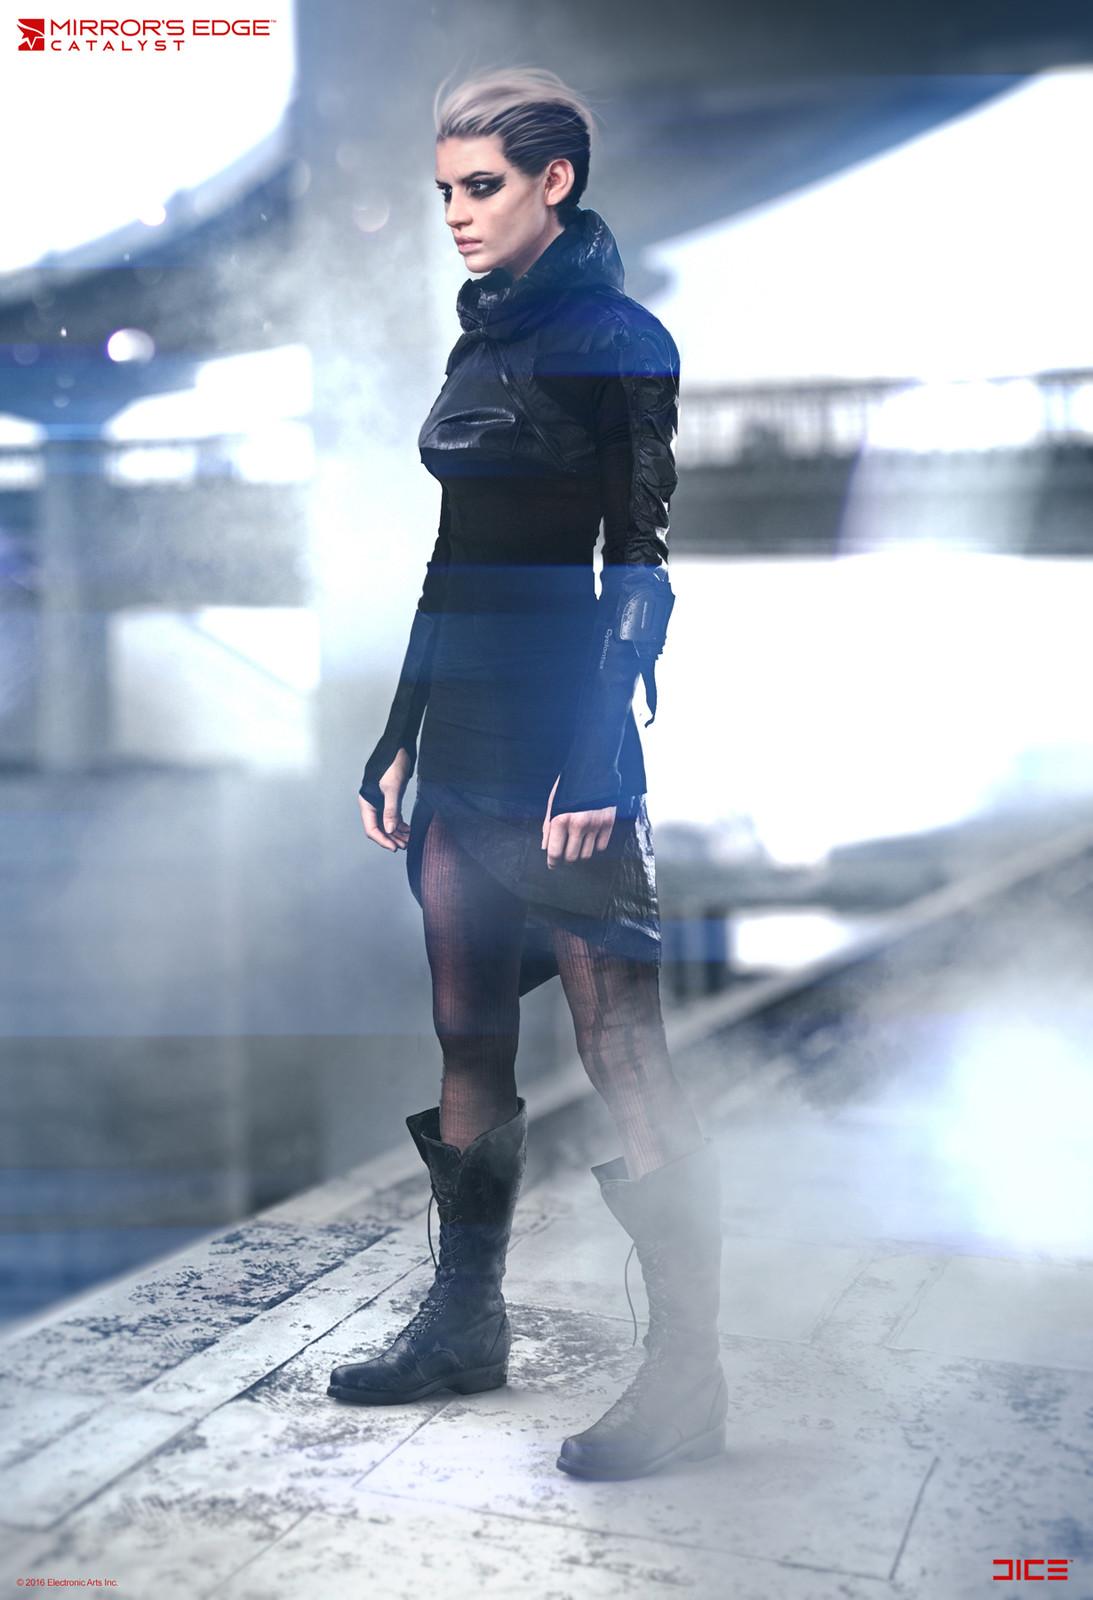 Black November Fighter #3 - Concept Art